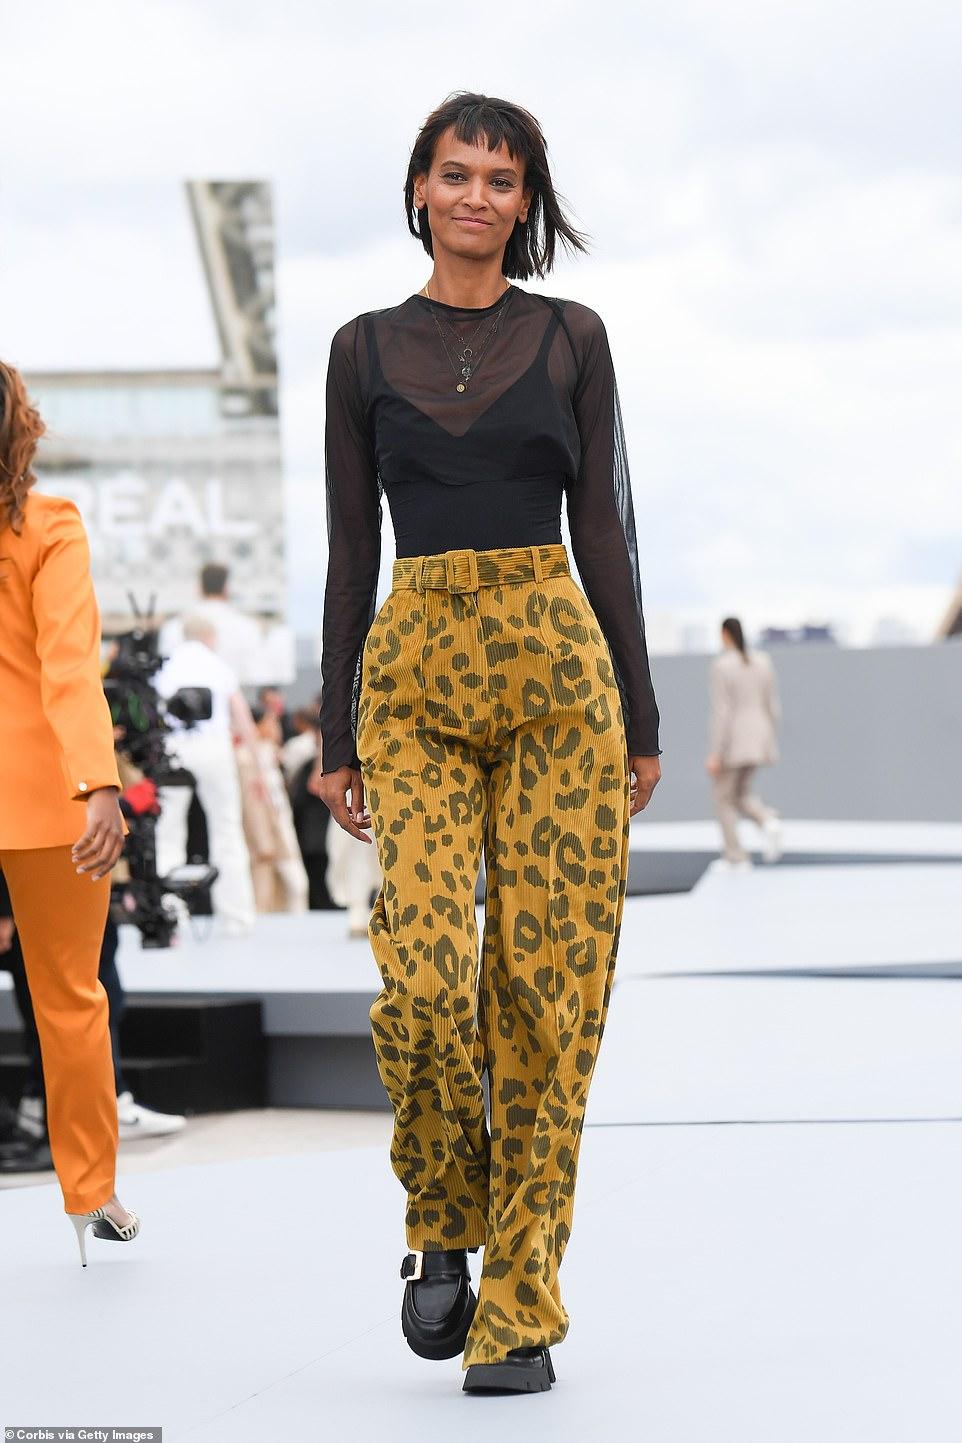 , Camila Cabello, Amber Heard and Dame Helen Mirren lead the Paris Fashion Week glamour, Nzuchi Times National News